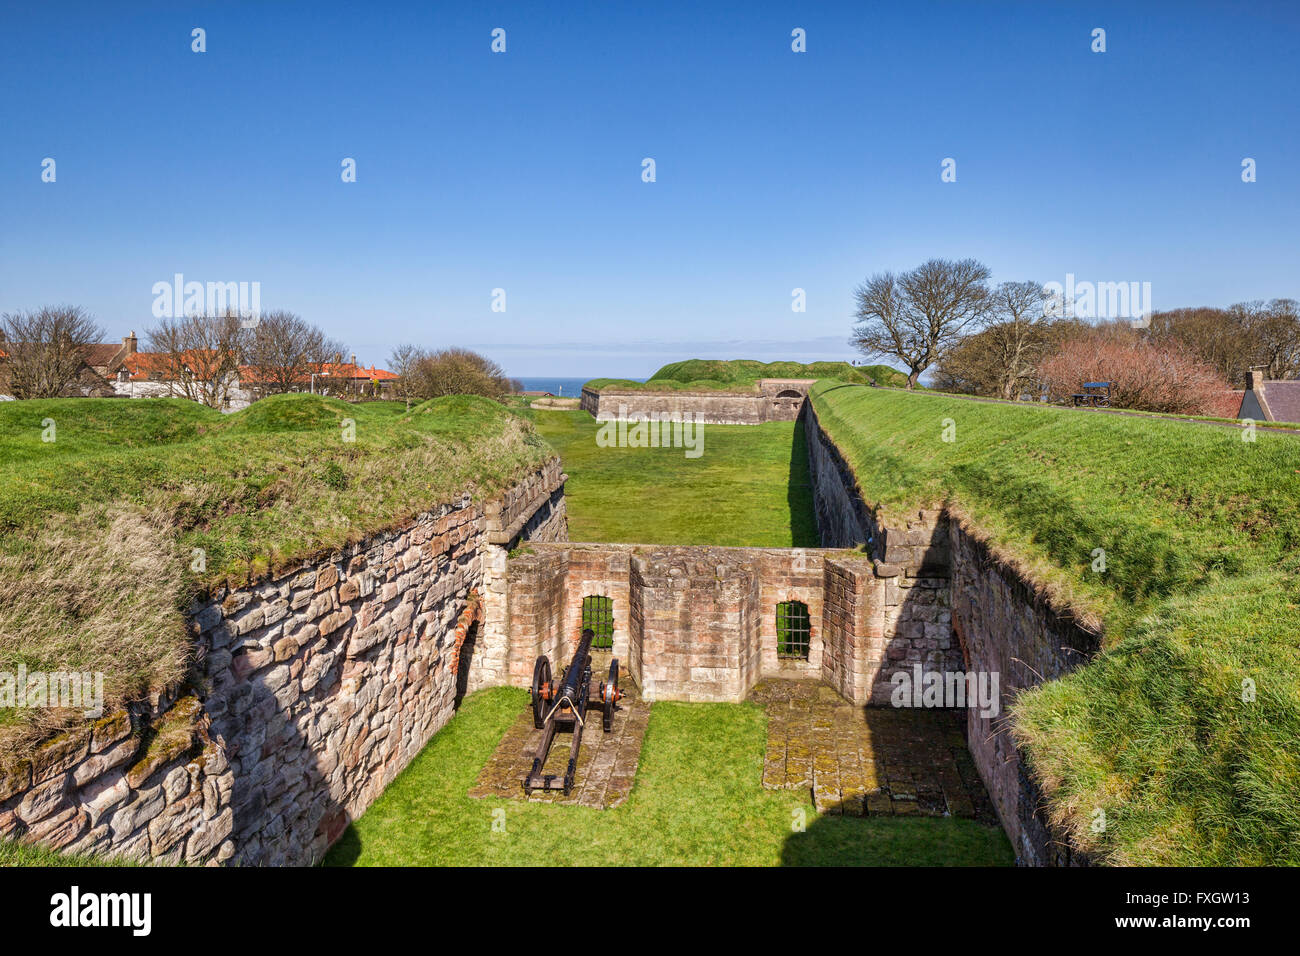 Gun emplacement on the town walls at Berwick-upon-Tweed, Northumberland,England, UK - Stock Image